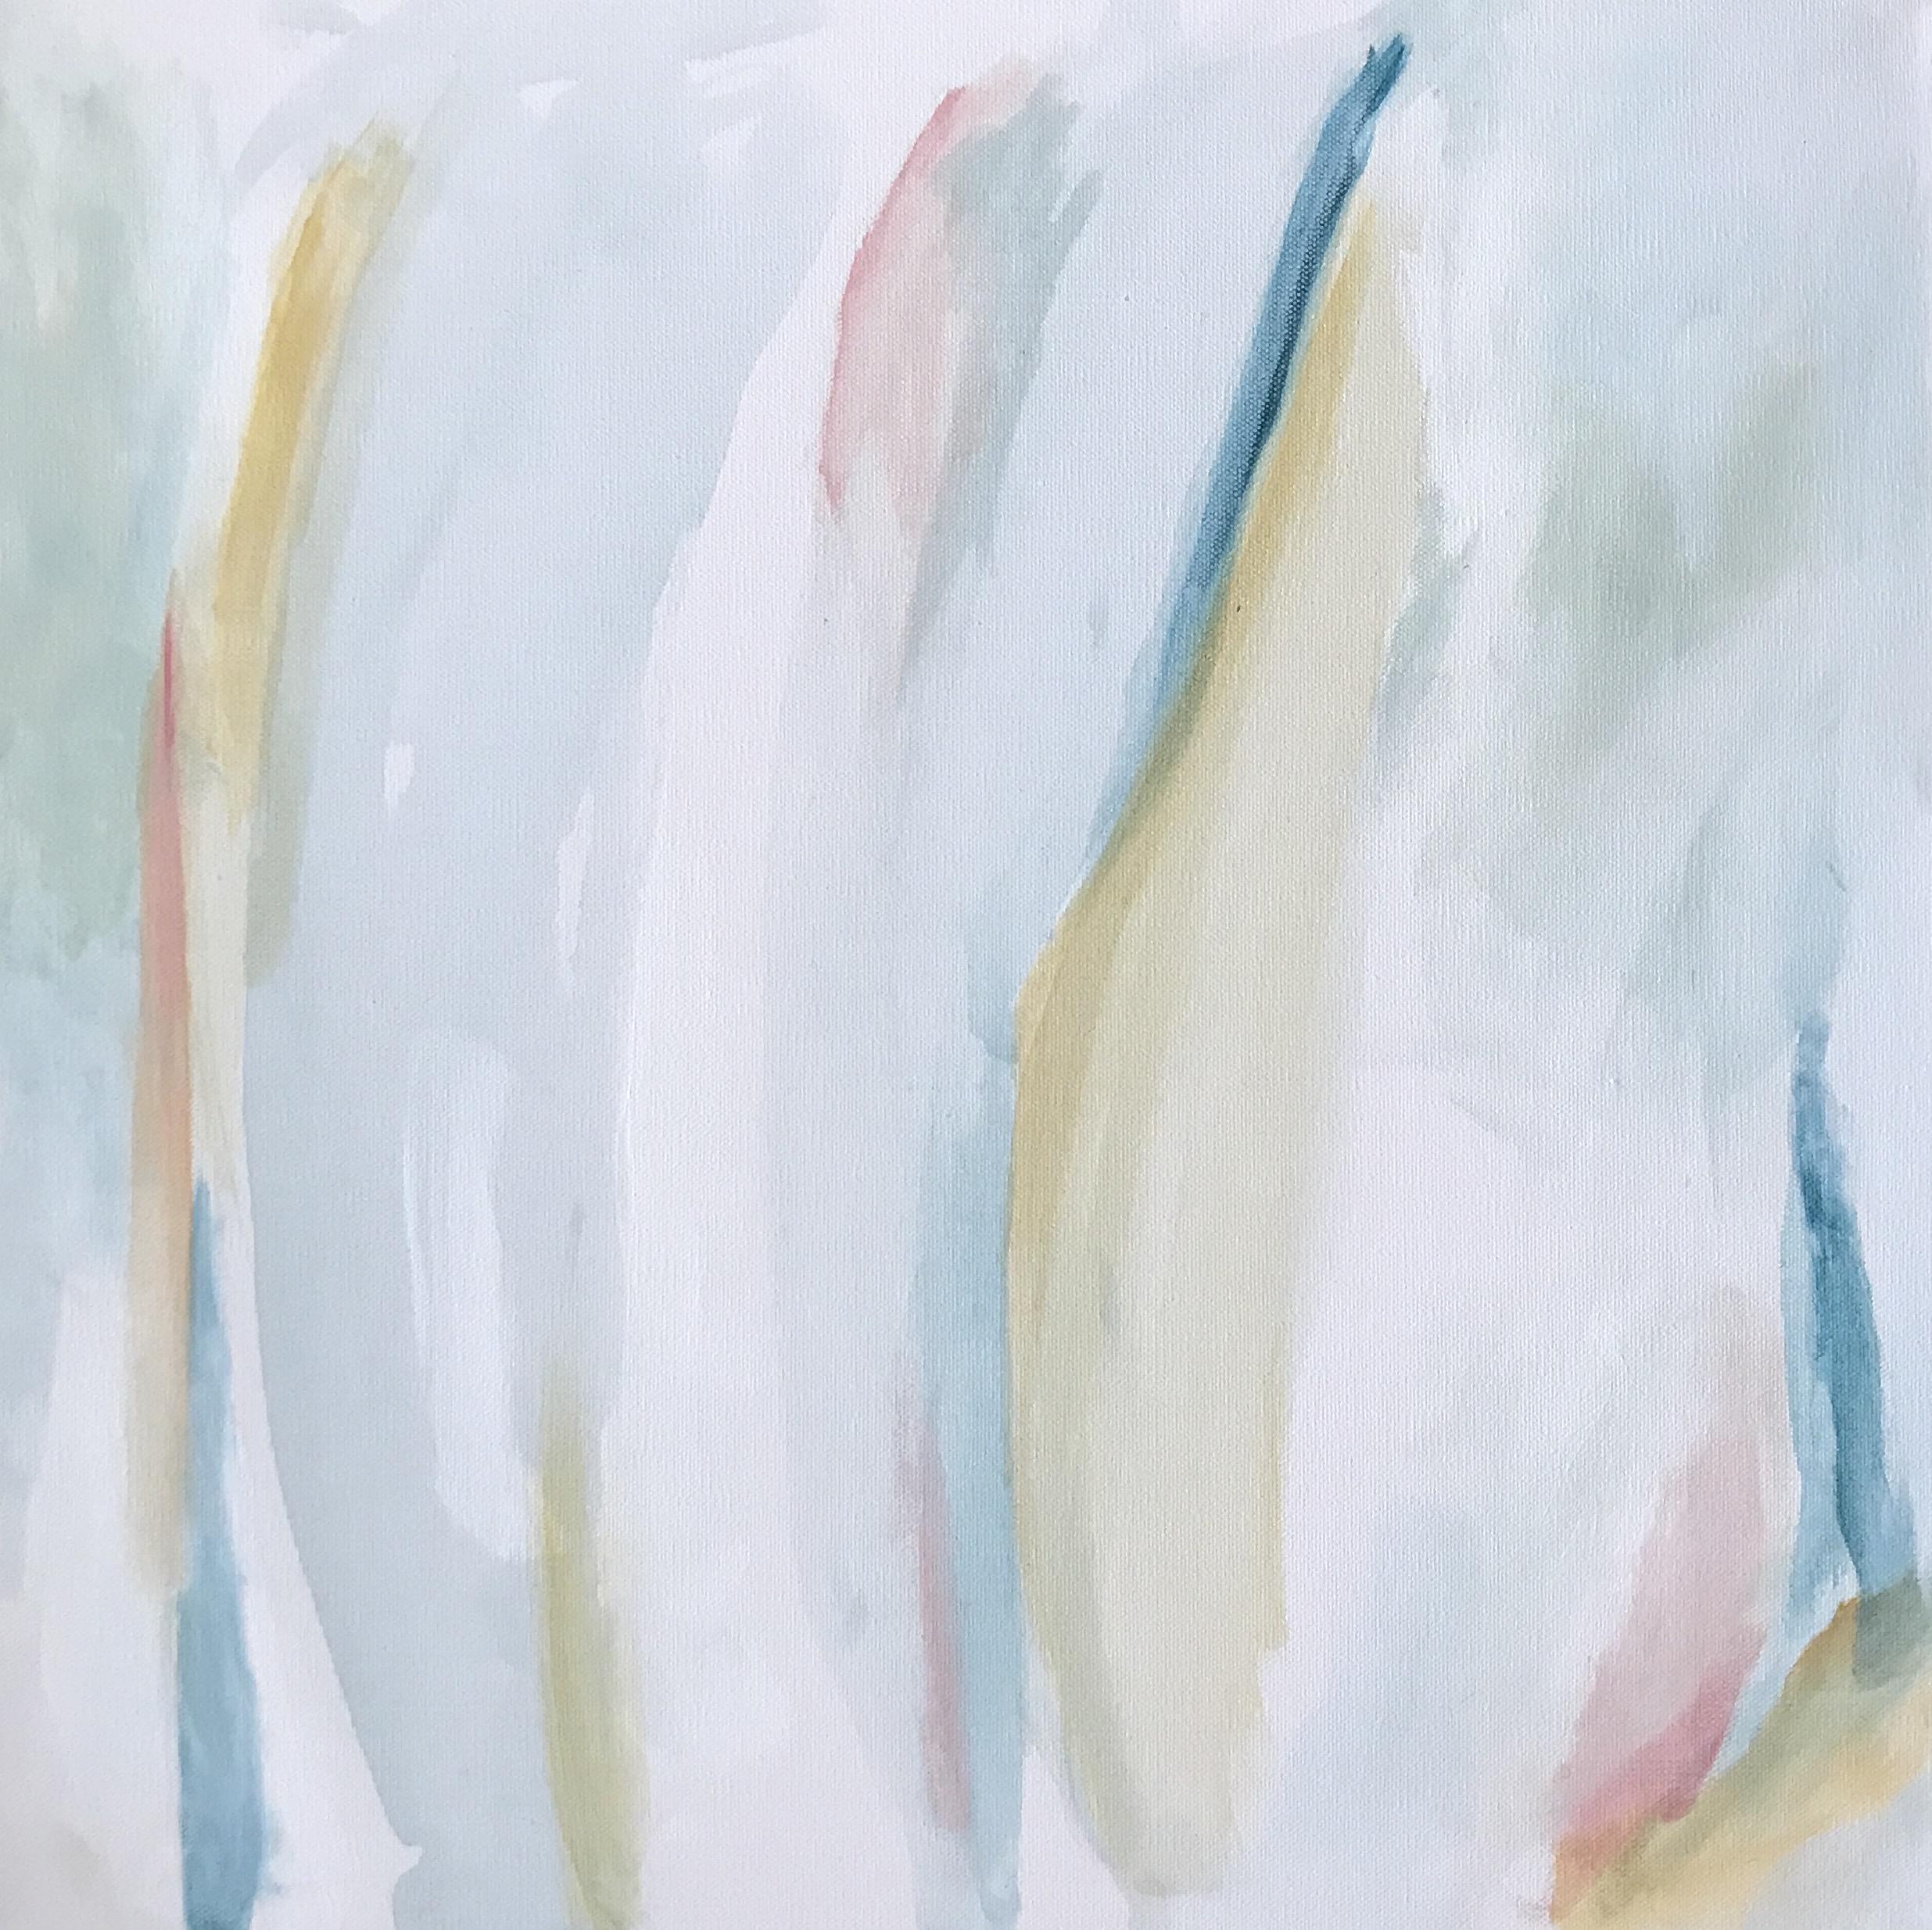 """Lightened"" 1/30 24x24"" acrylic on canvas"